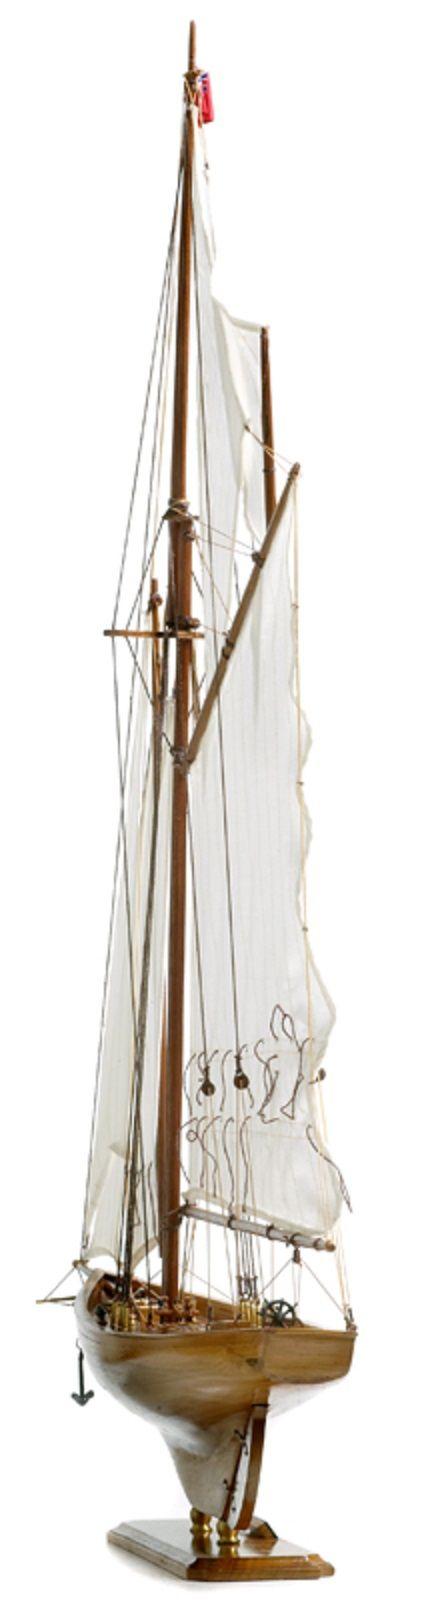 117-8452-Britannia-model-yacht-Superior-Range